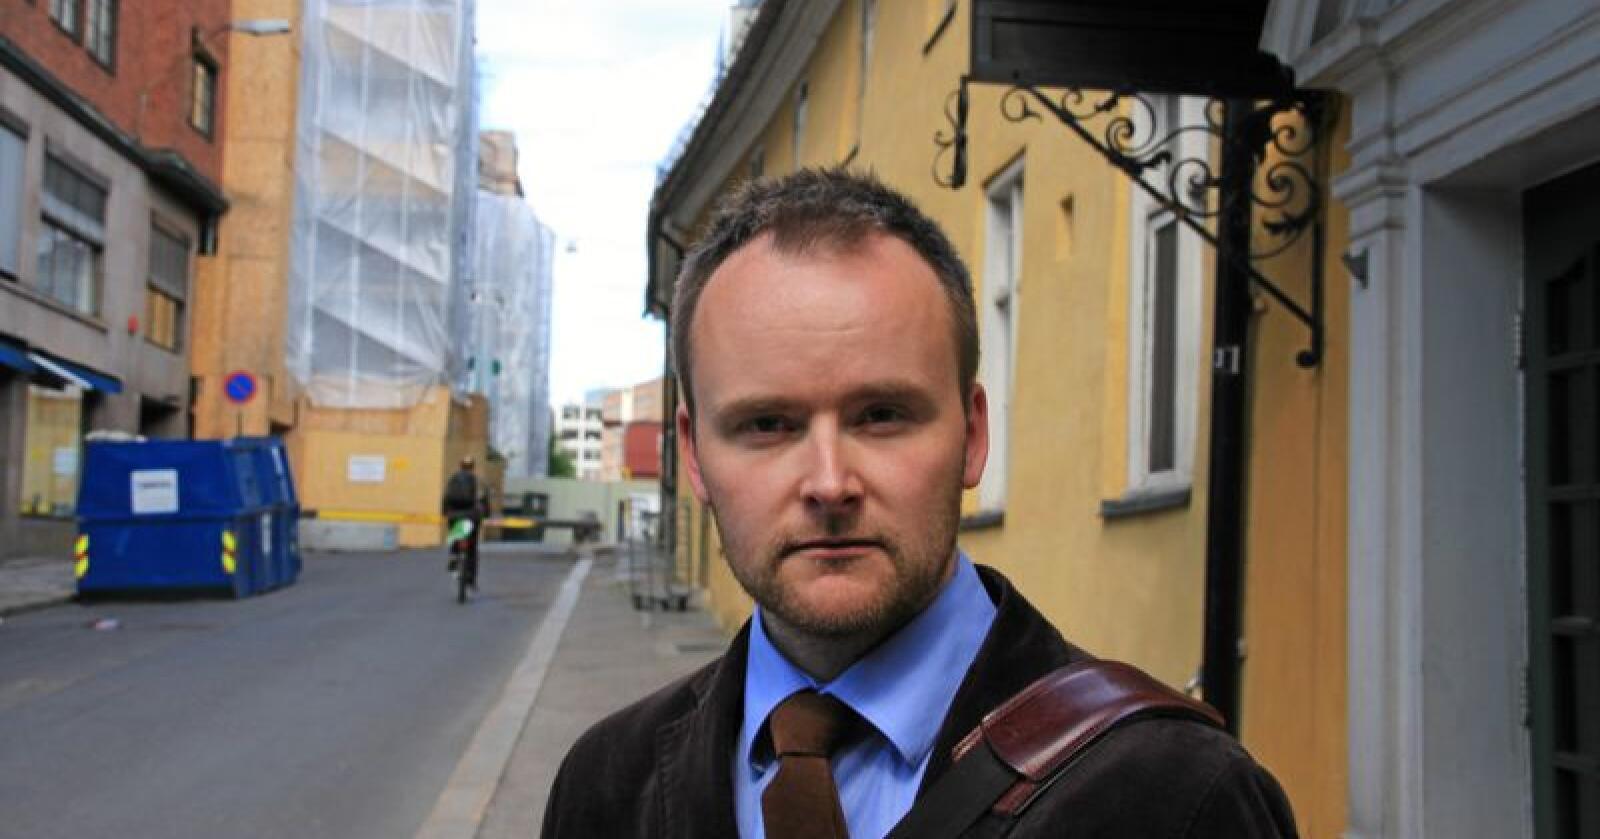 Jusprofessor Eirik Holmøyvik. Foto: Eva Aalberg Undheim